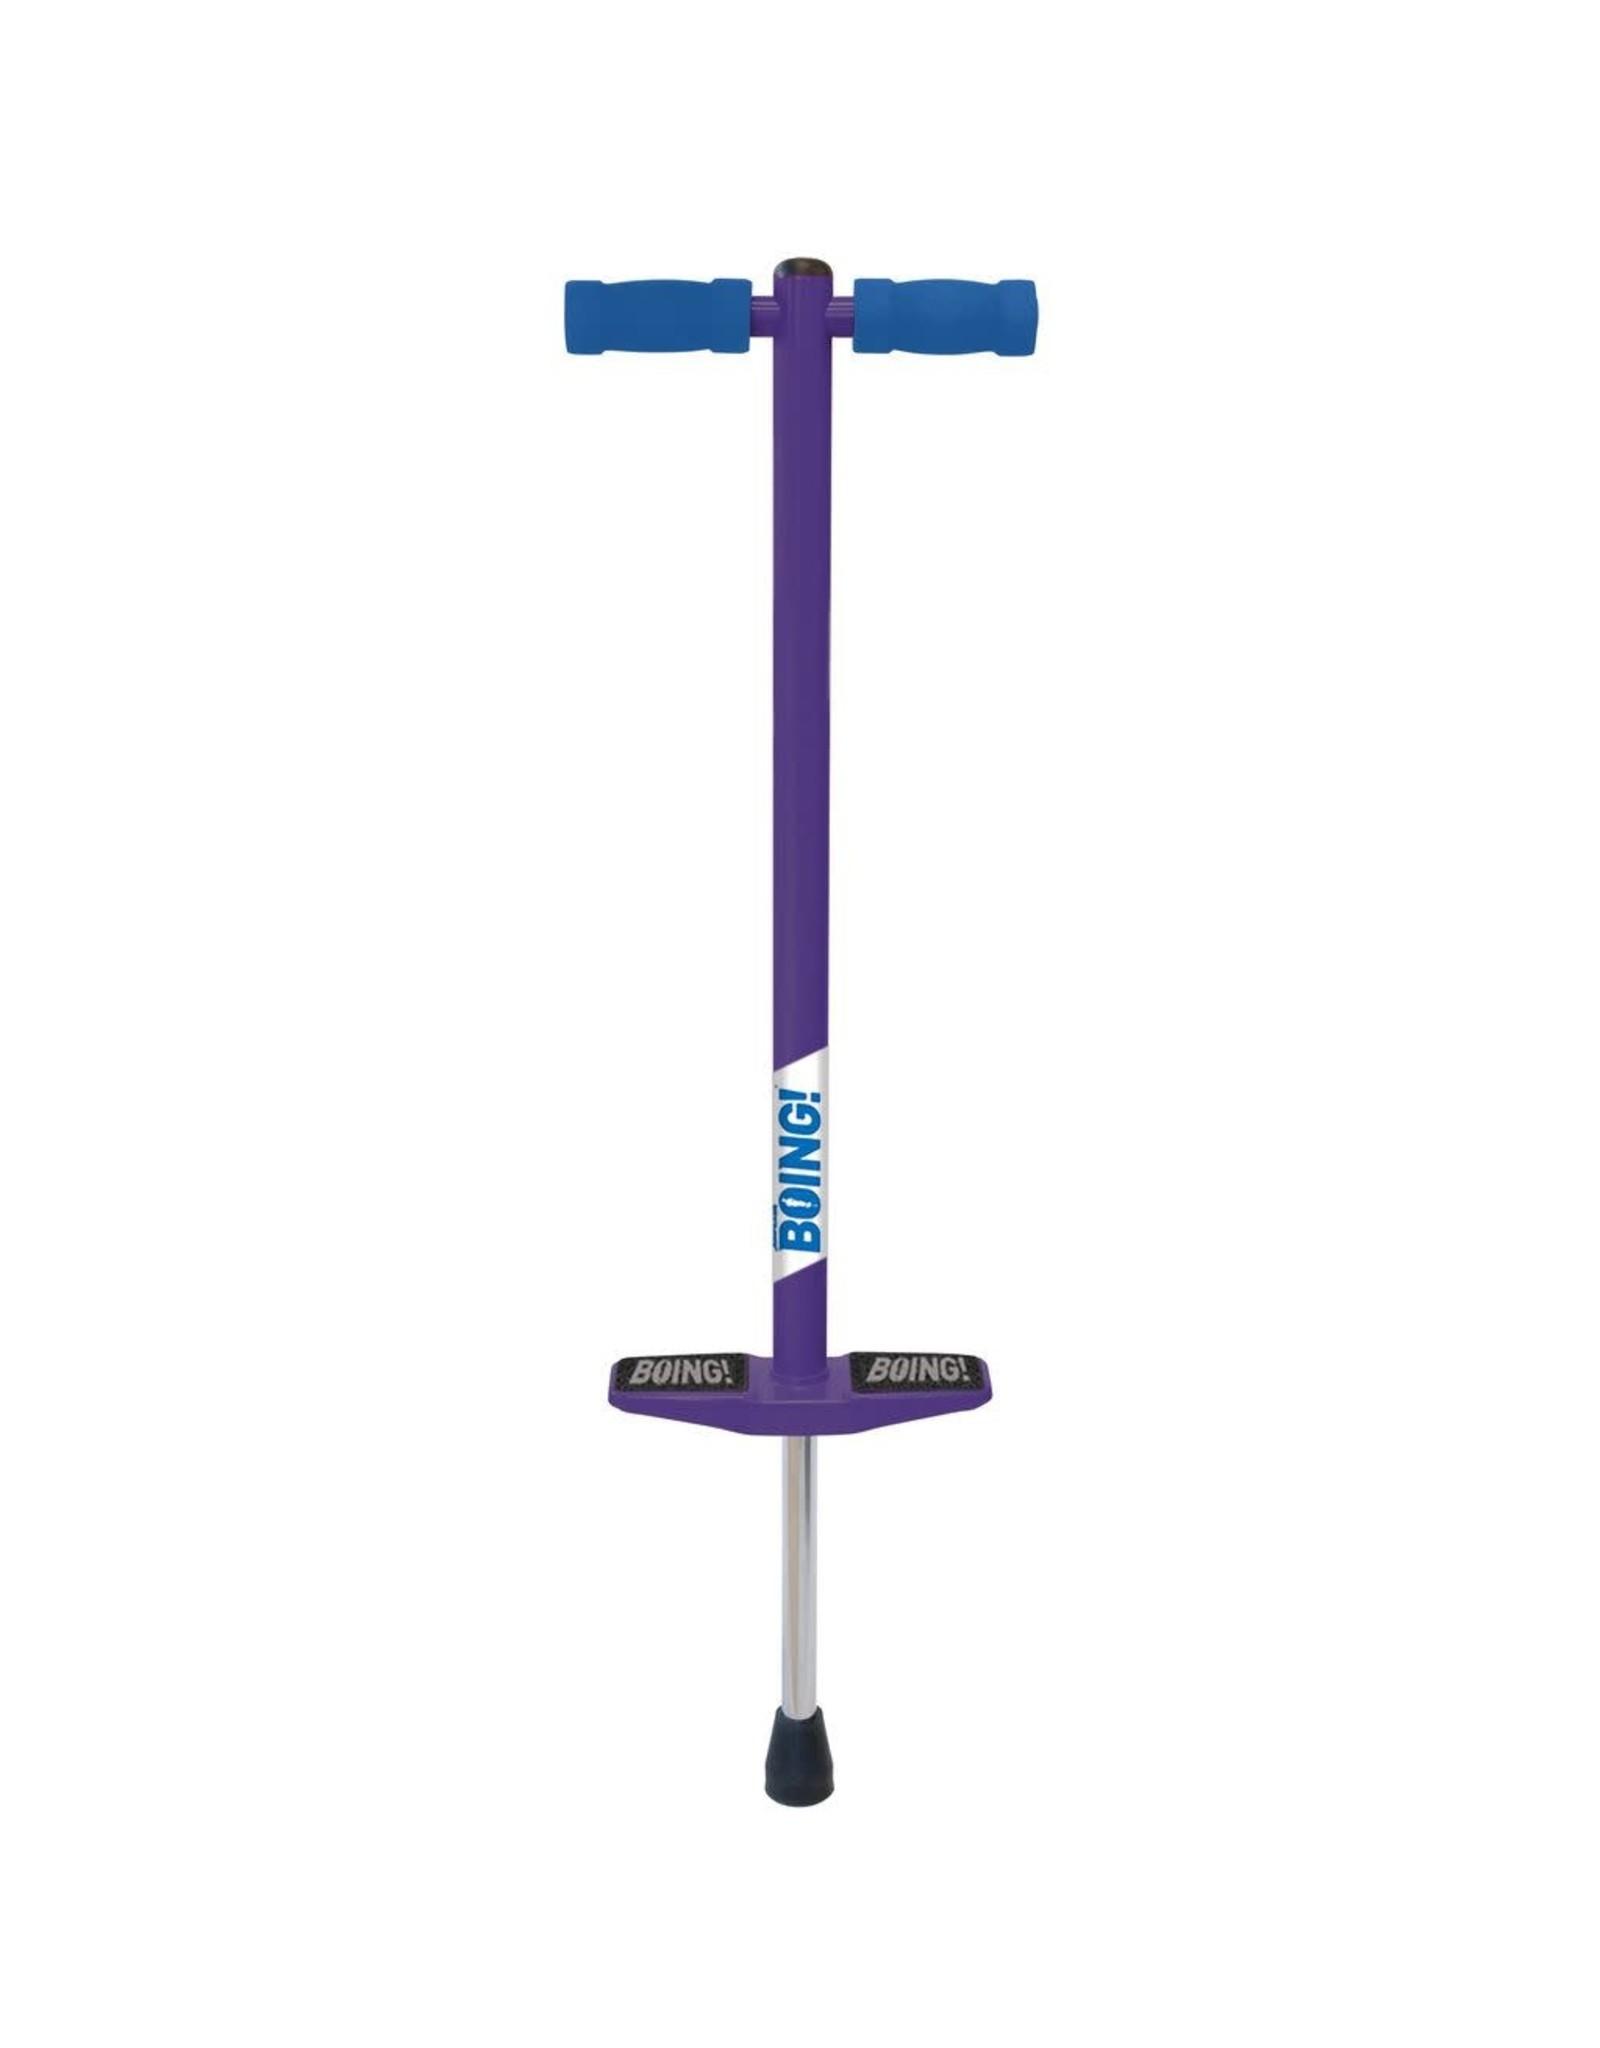 Geospace Boing Jr. Pogo Stick - Purple